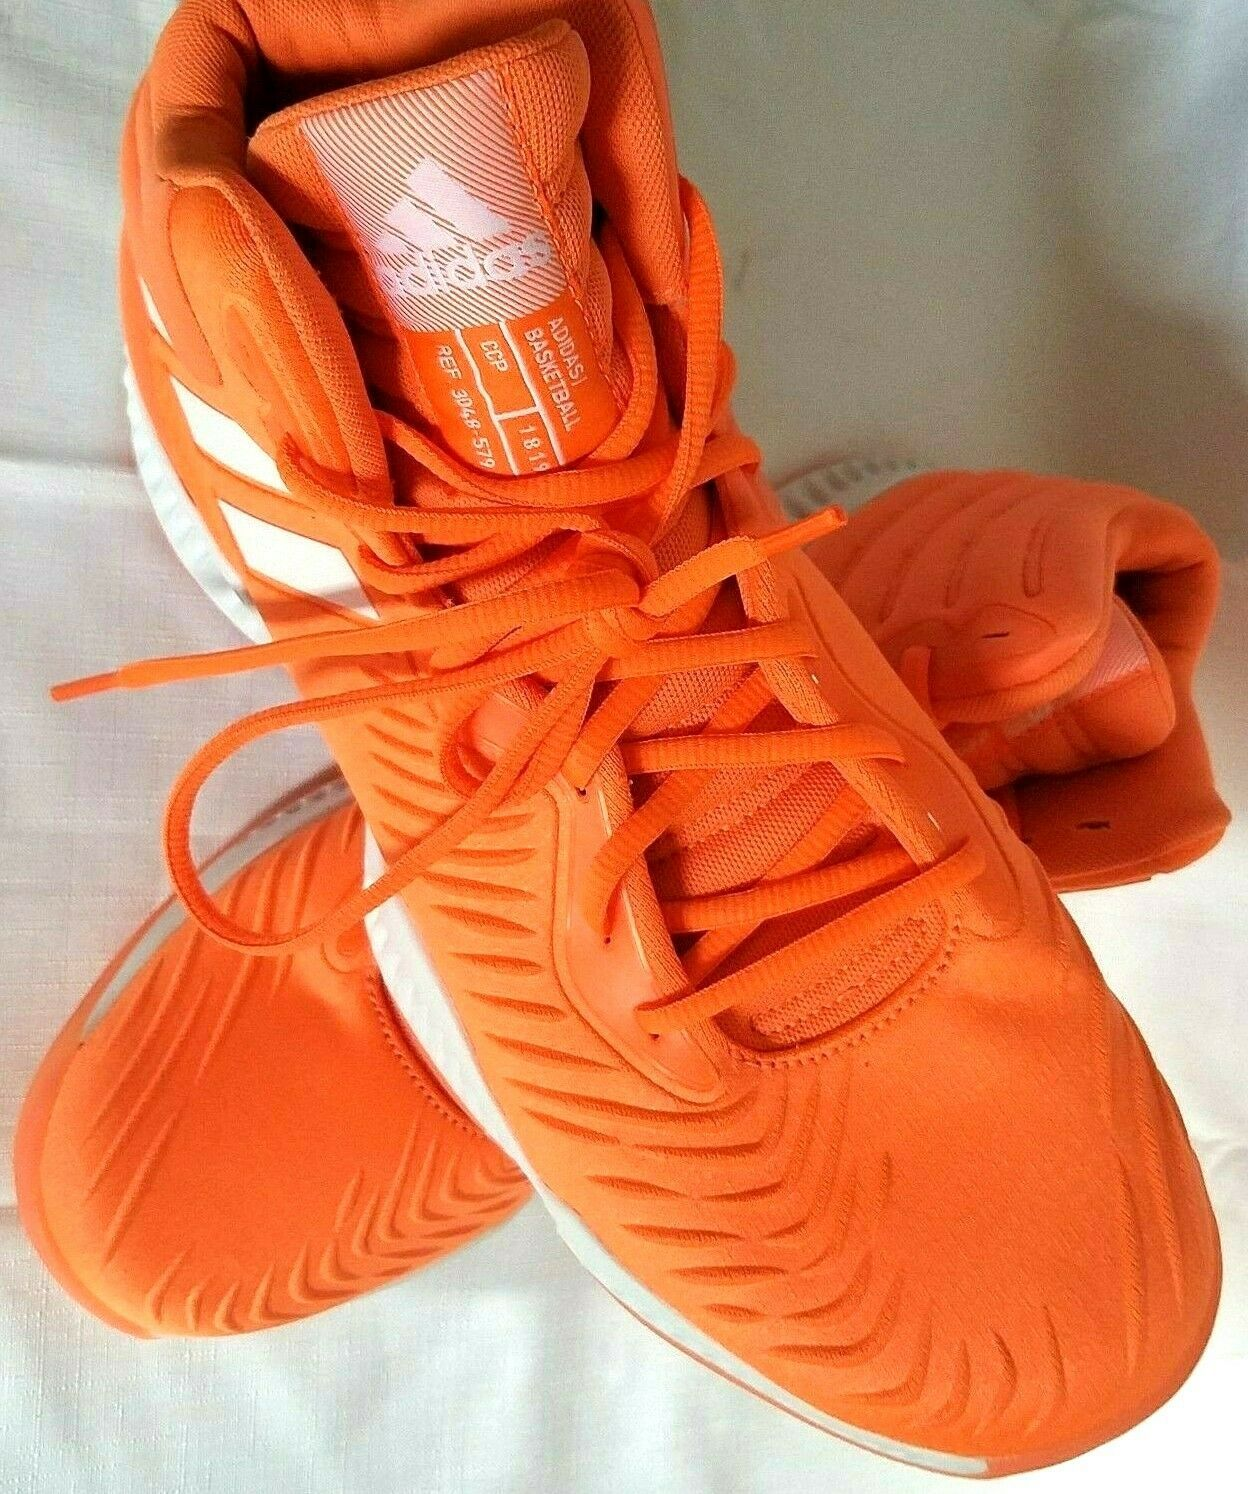 adidas SM Mad Bounce Mens 12.5 D97371 Basketball Shoes Orange & White 2018 image 3